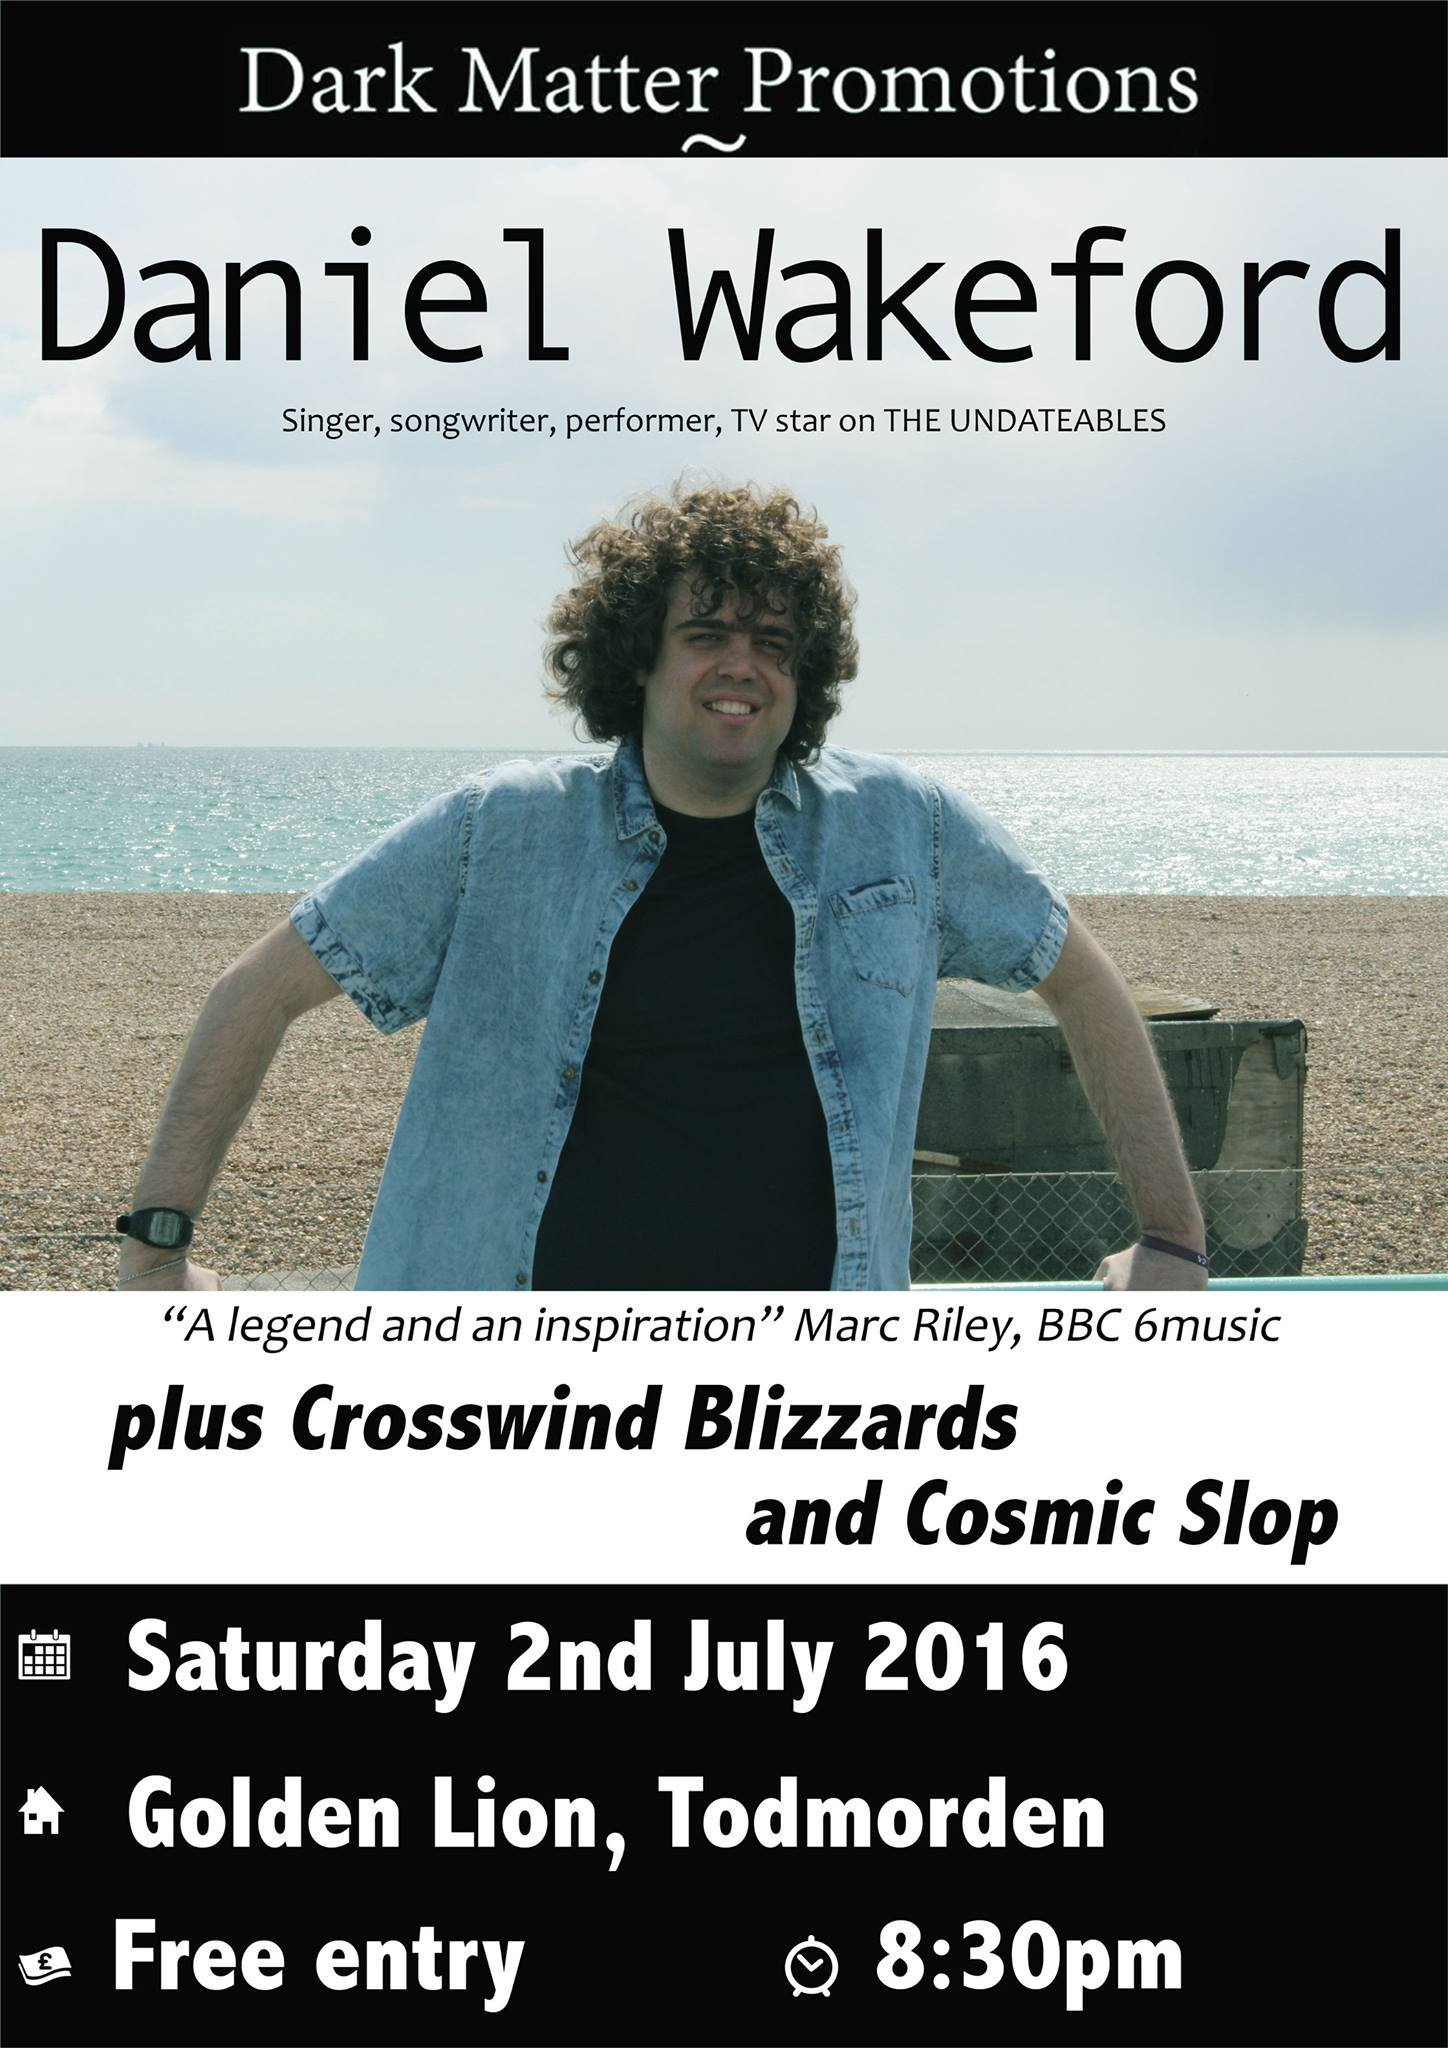 GIG PREVIEW: Daniel Wakeford, Cosmic Slop & Crosswind Blizzards ...